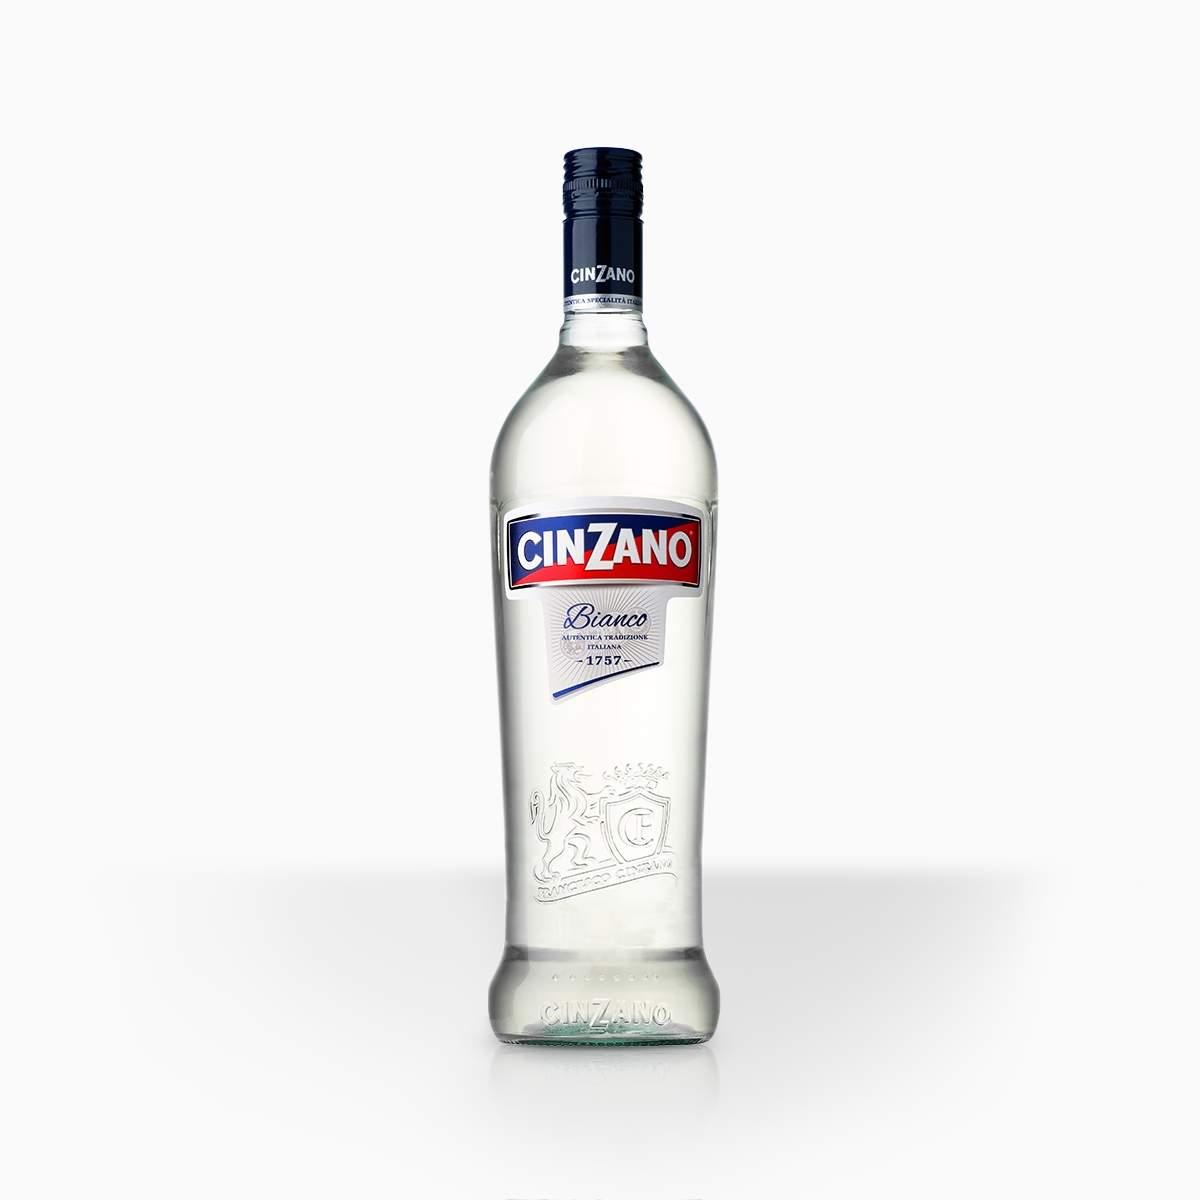 Cinzano Bianco 14,4% 1l